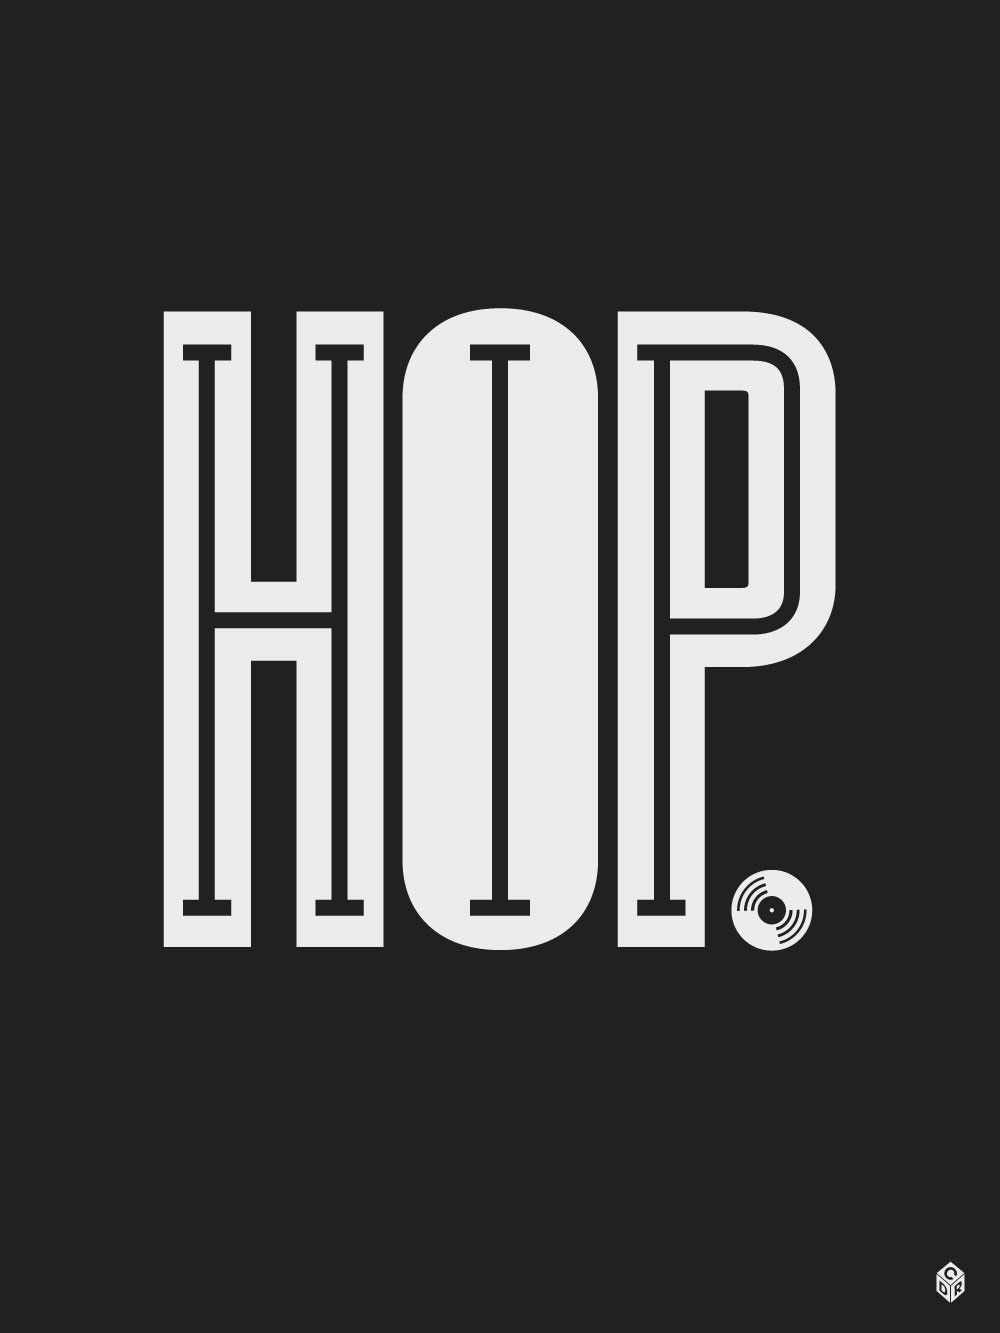 Essay on hip hop